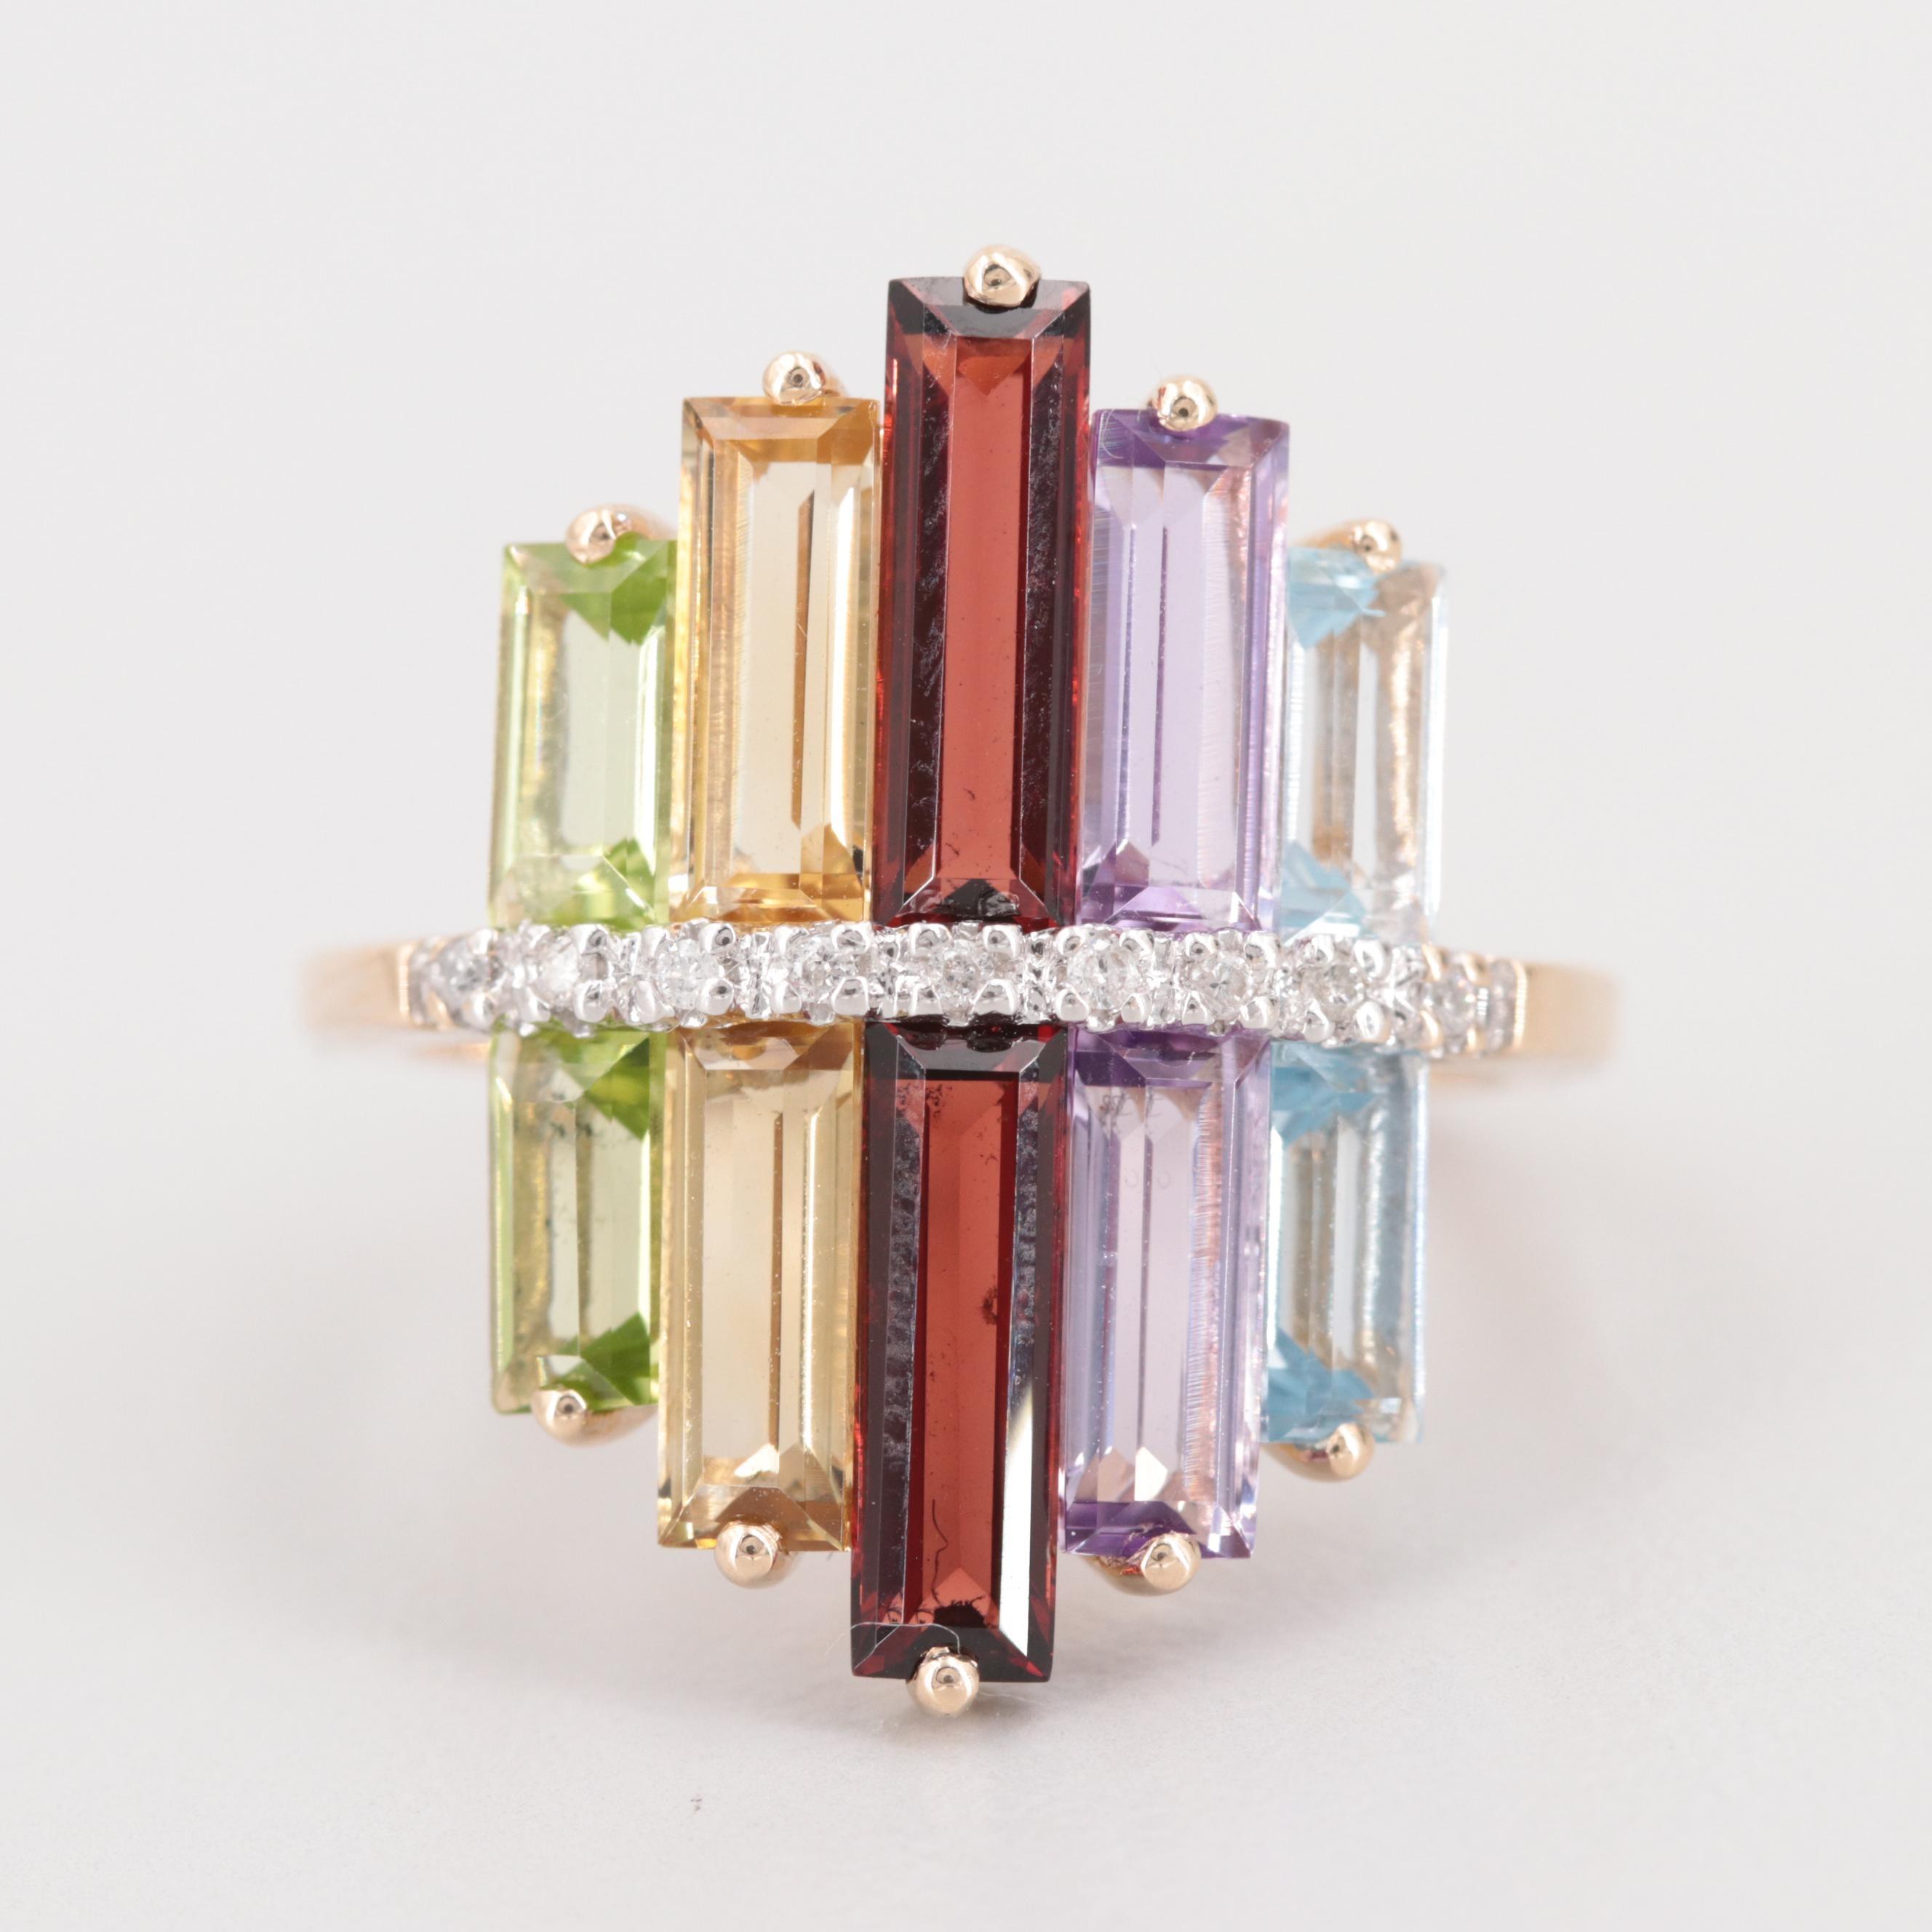 14K Yellow Gold Mixed Gemstone and Diamond Ring